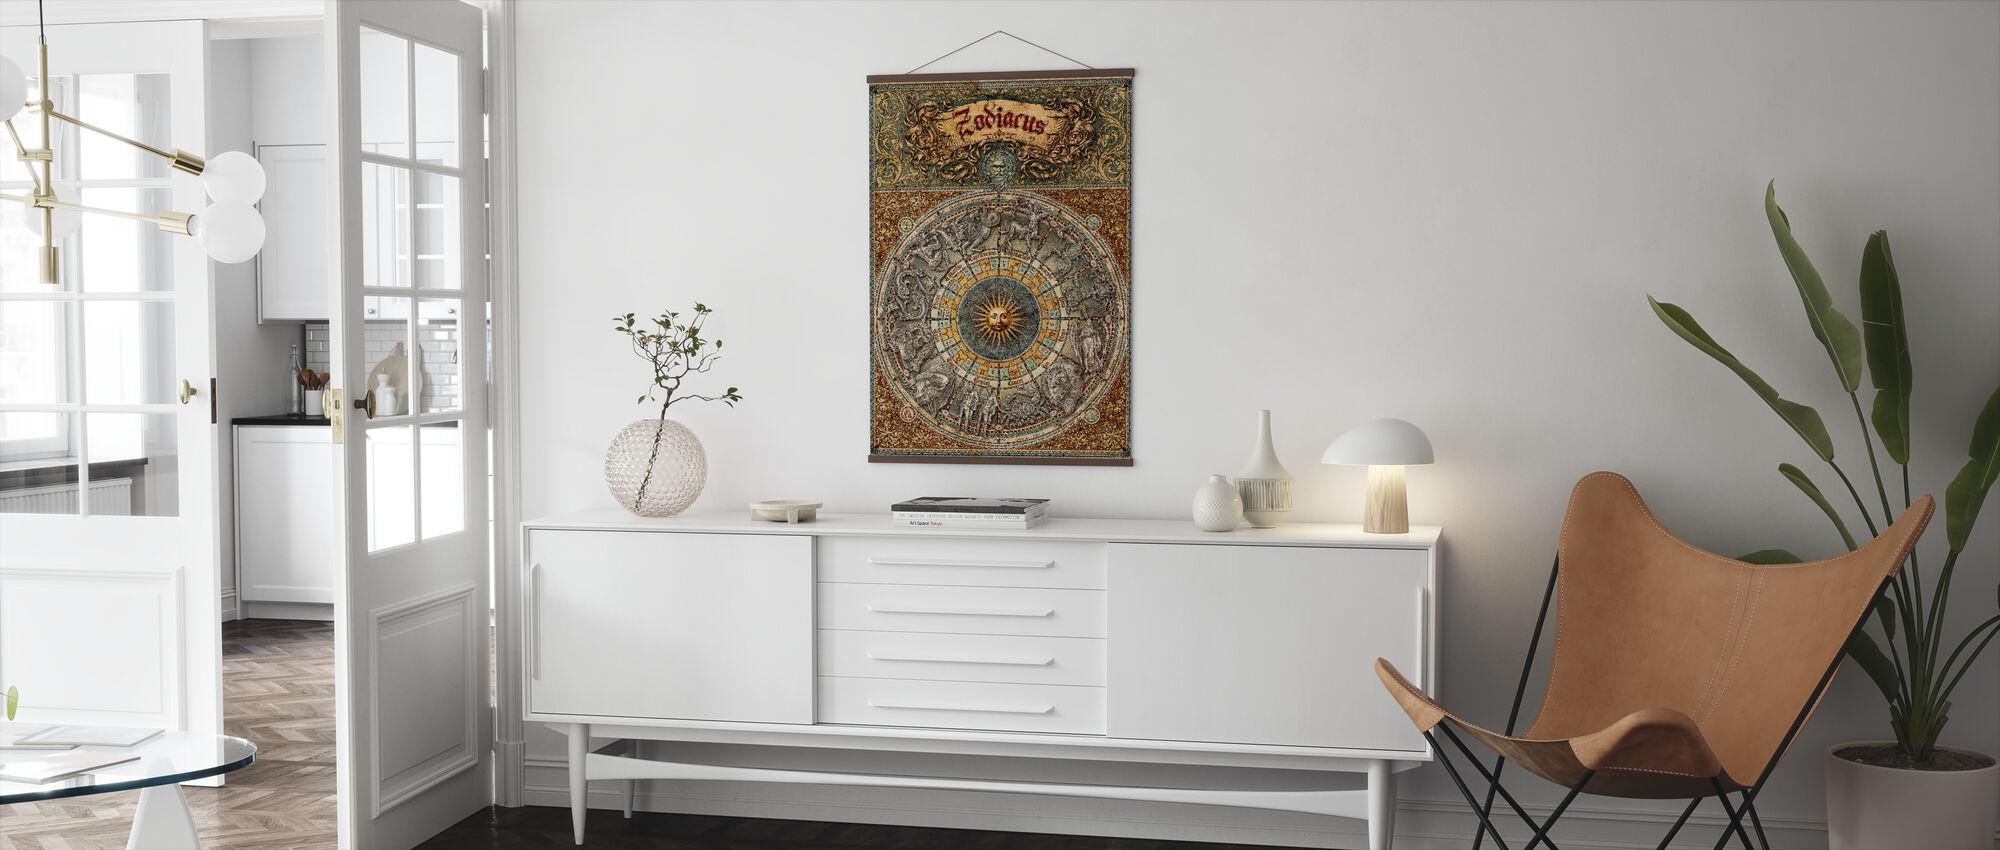 Zodiac - Poster - Living Room